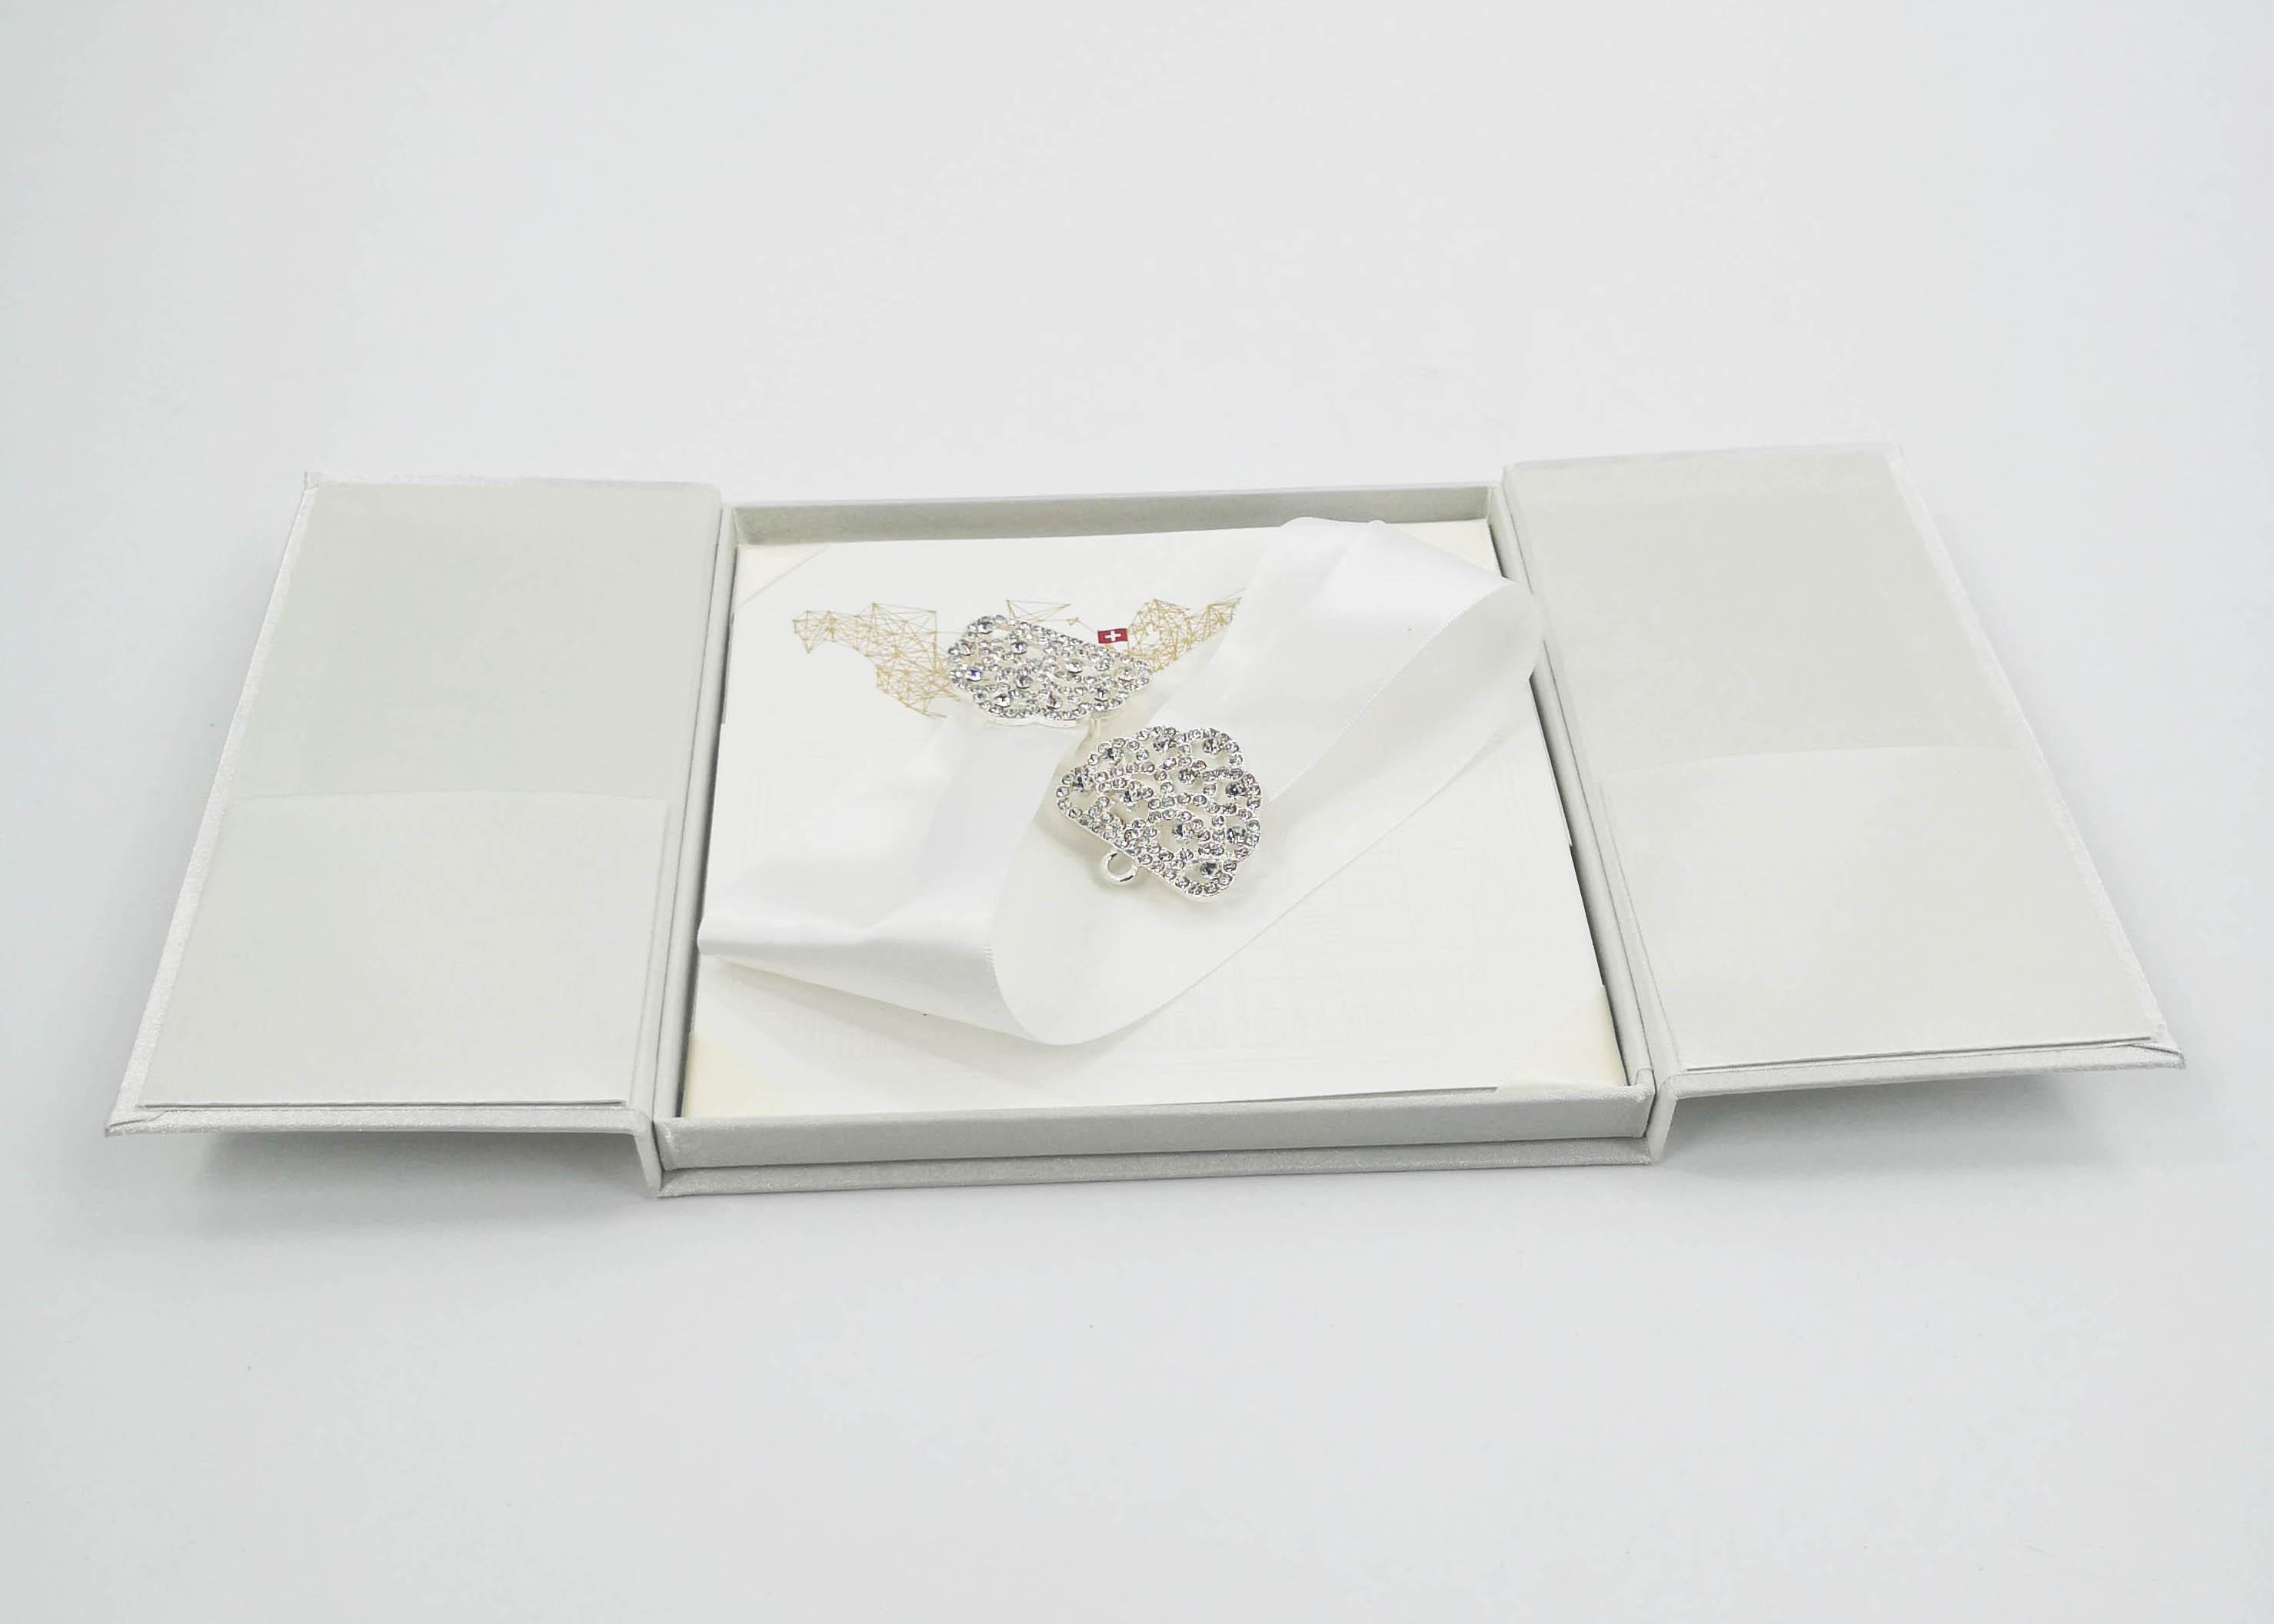 Gift Box Wedding Invitations: Elegant White Silk Cardboard Present Gift Box Wedding